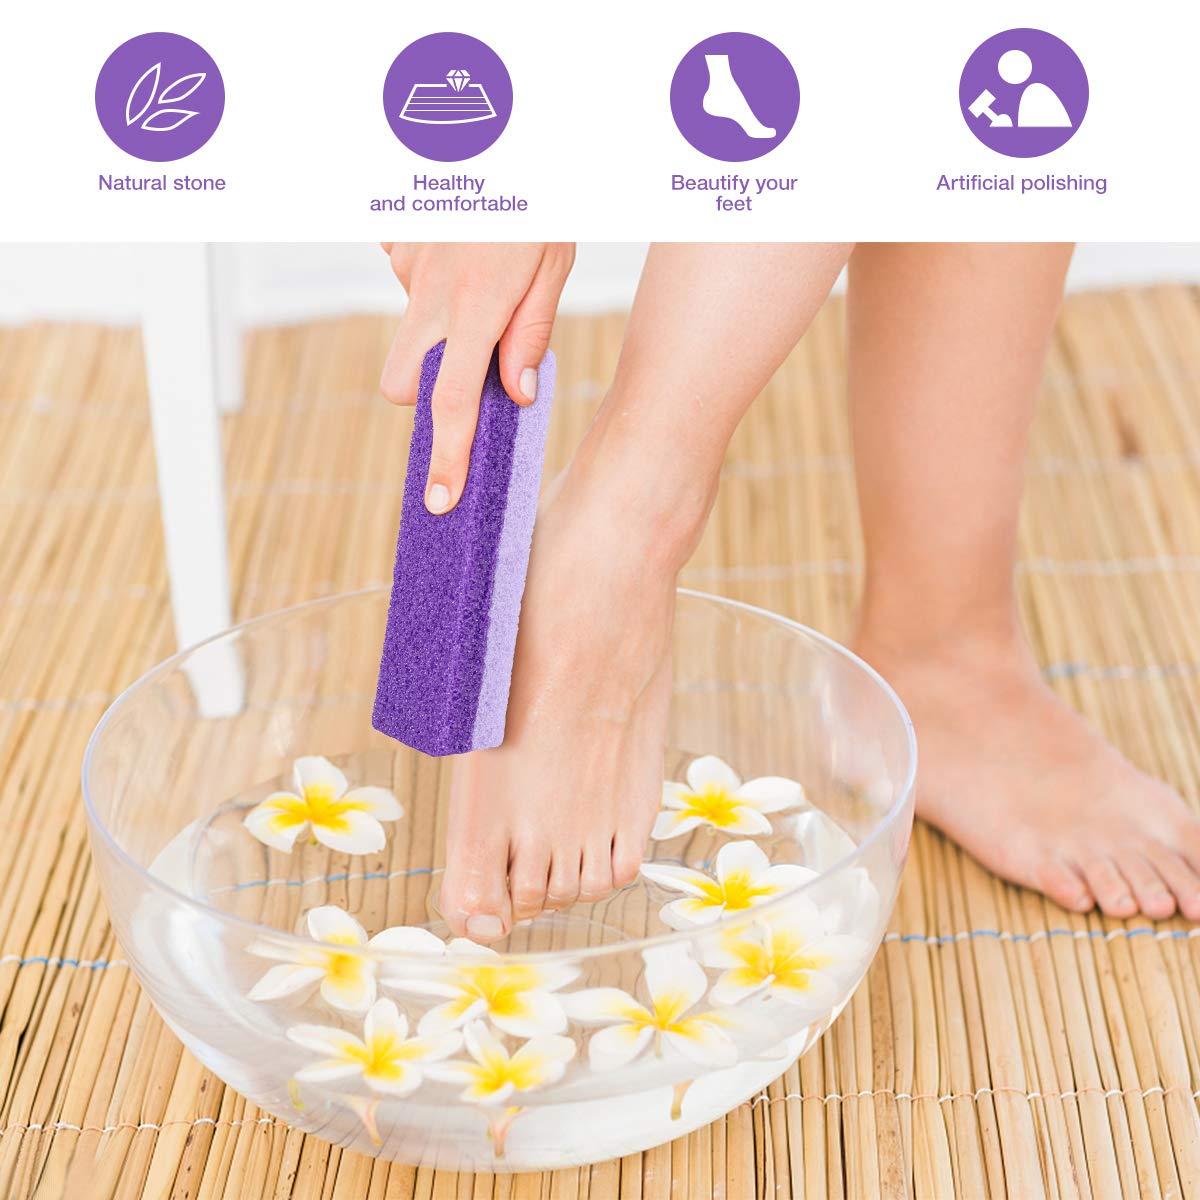 Foot Exfoliator Pedicure Tool Foot Callus Remover Scrubber 2pcs (Purple)